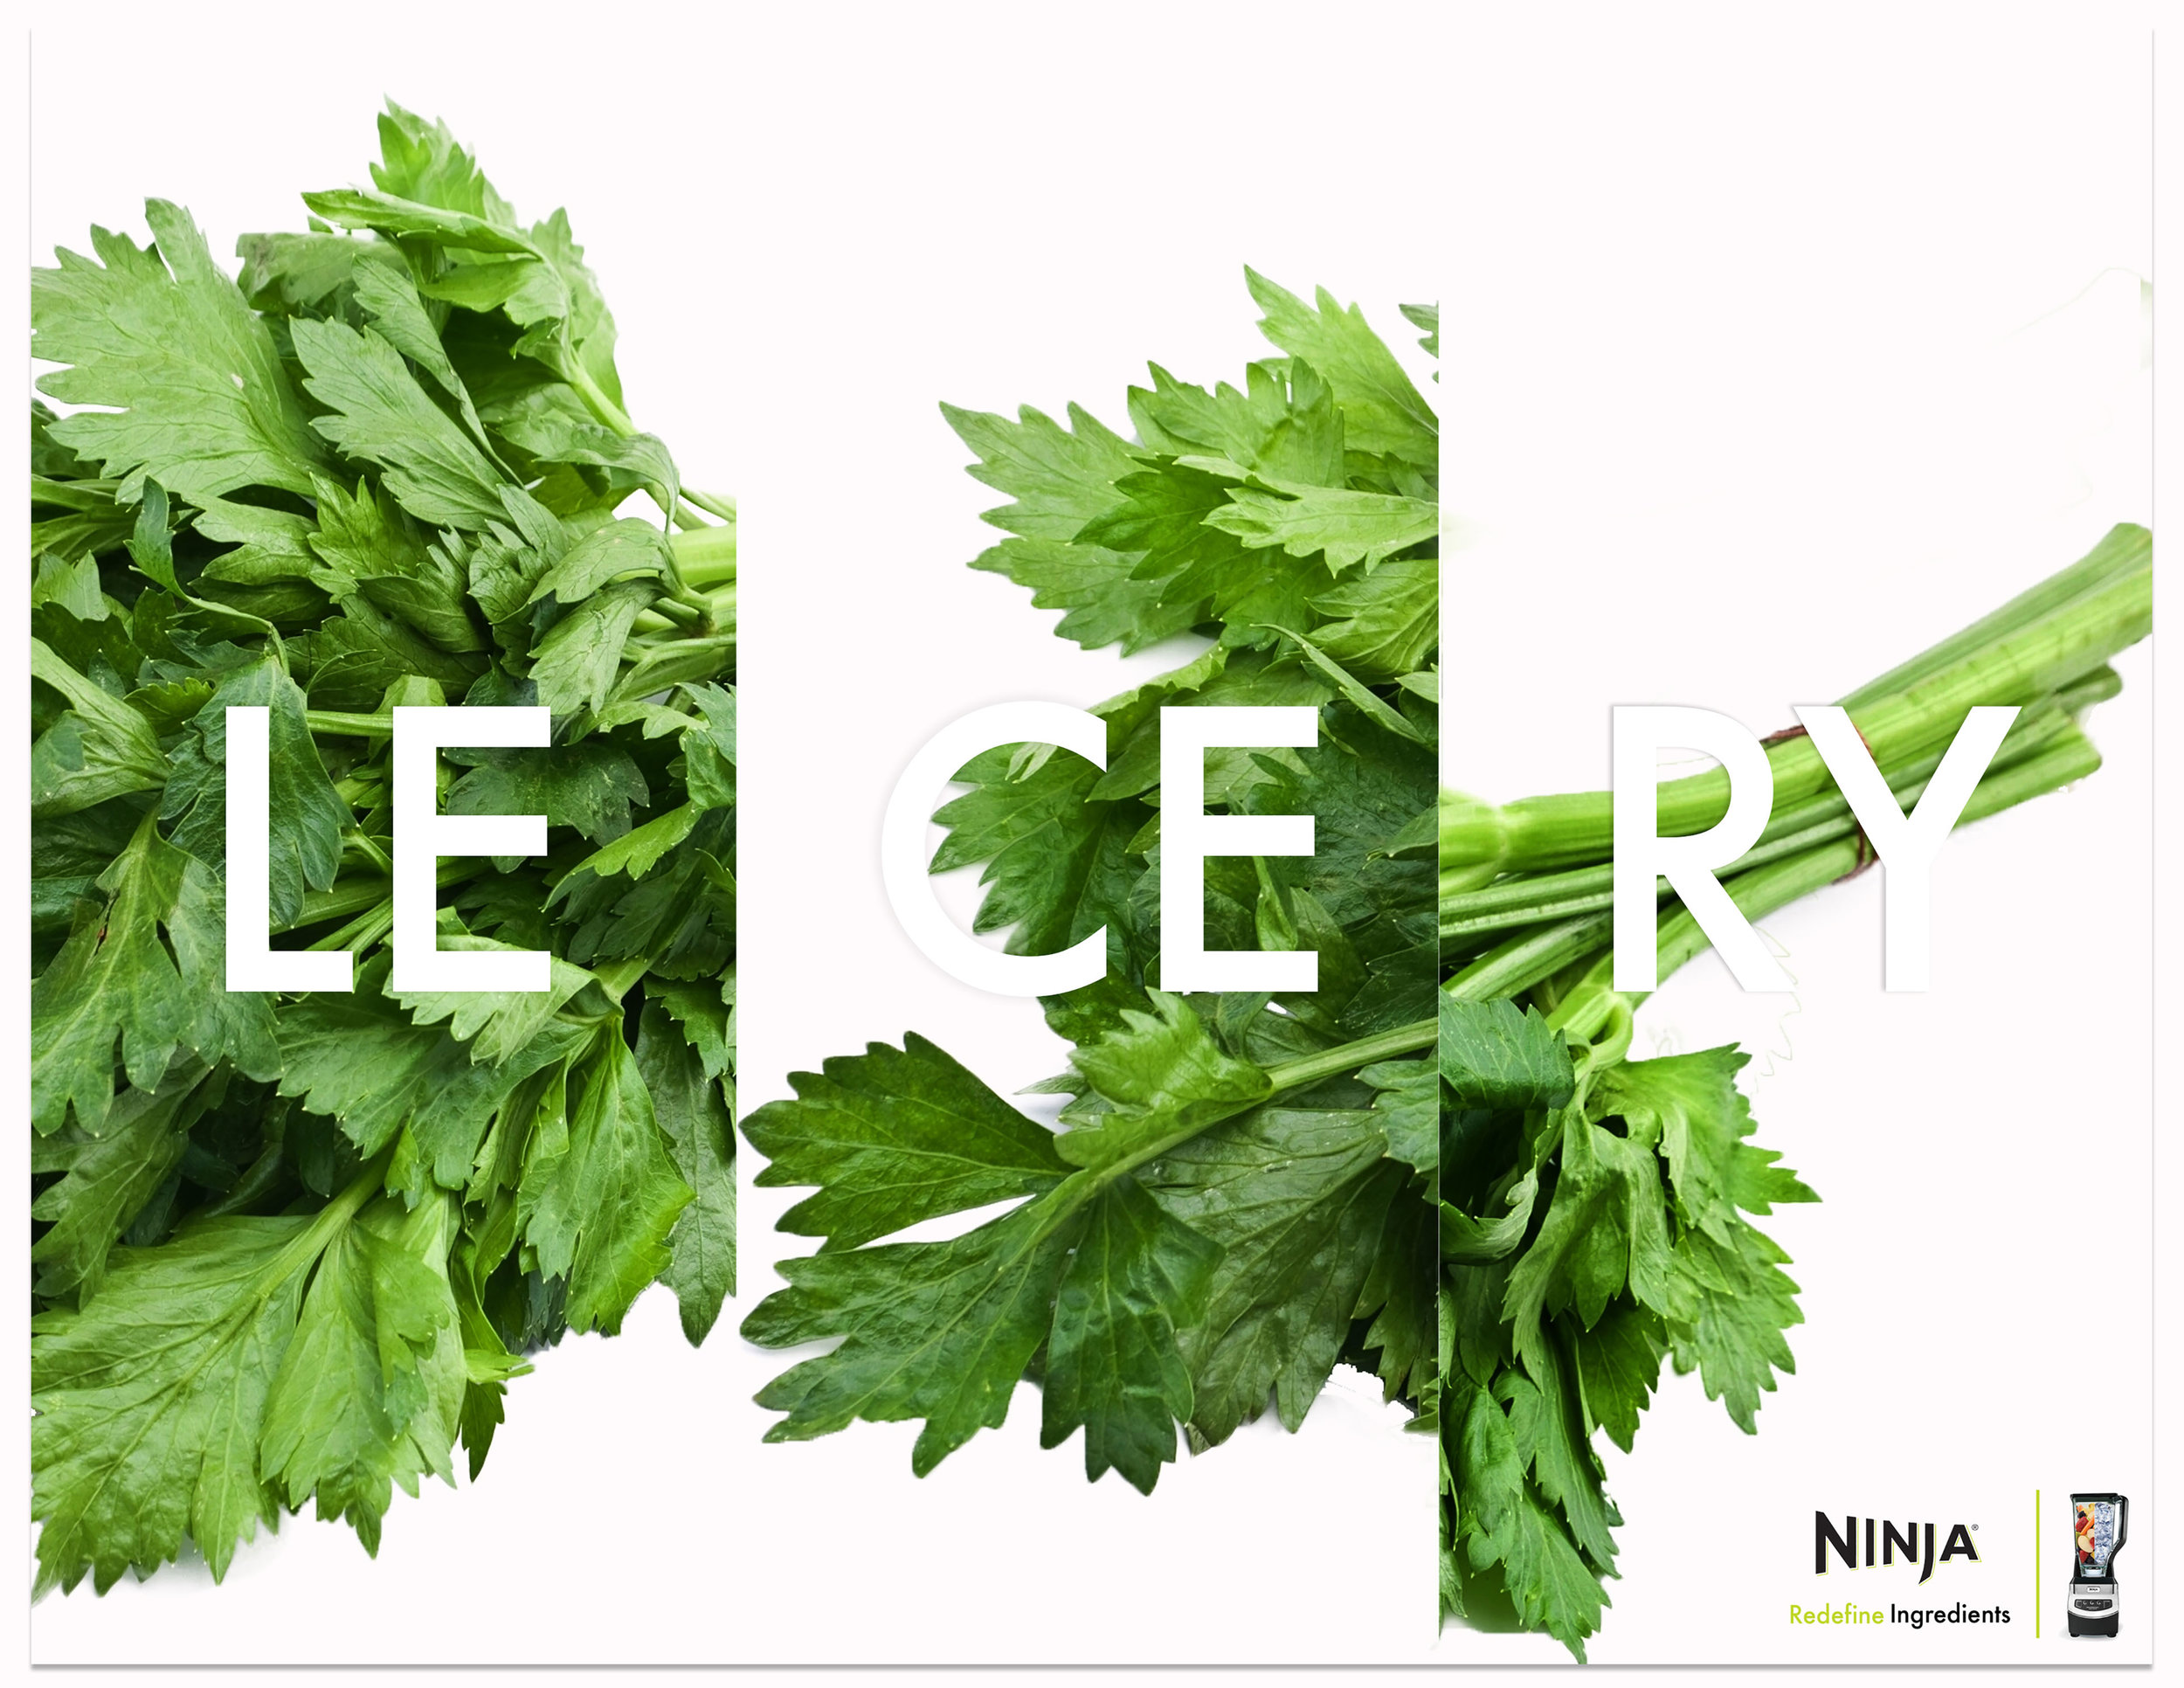 NINJA|Redefine|celery|HD2.jpg